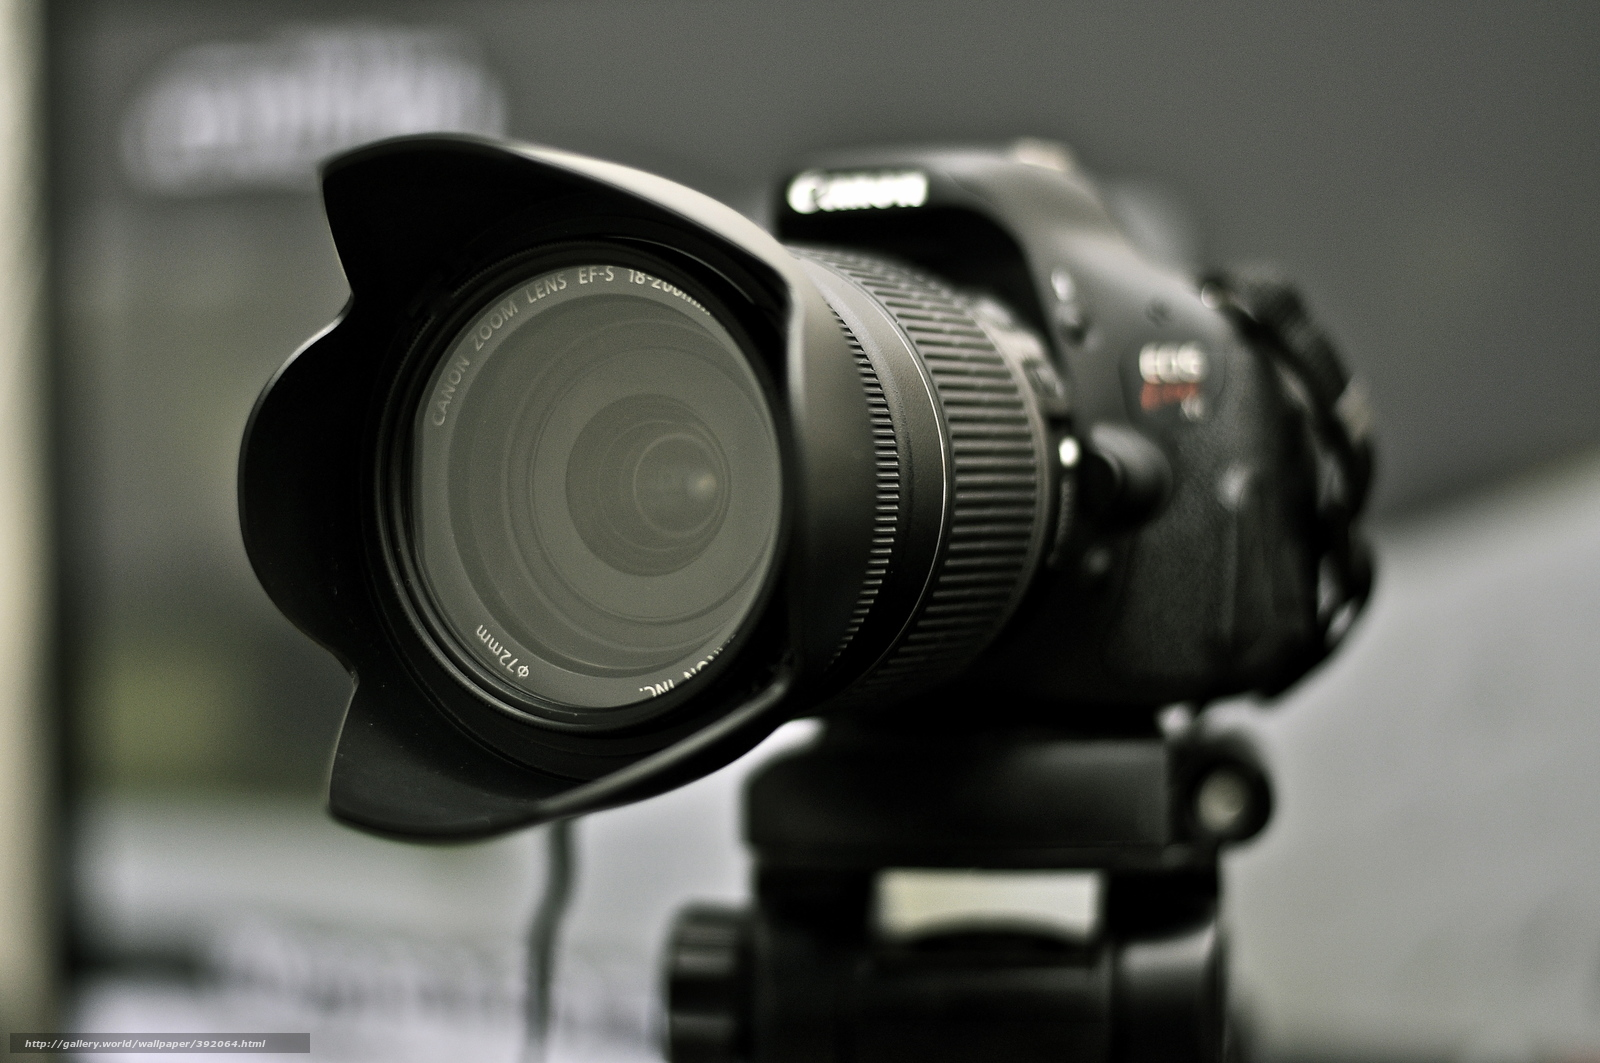 Tlcharger fond d 39 ecran canon appareil photo lentille for Ecran appareil photo canon